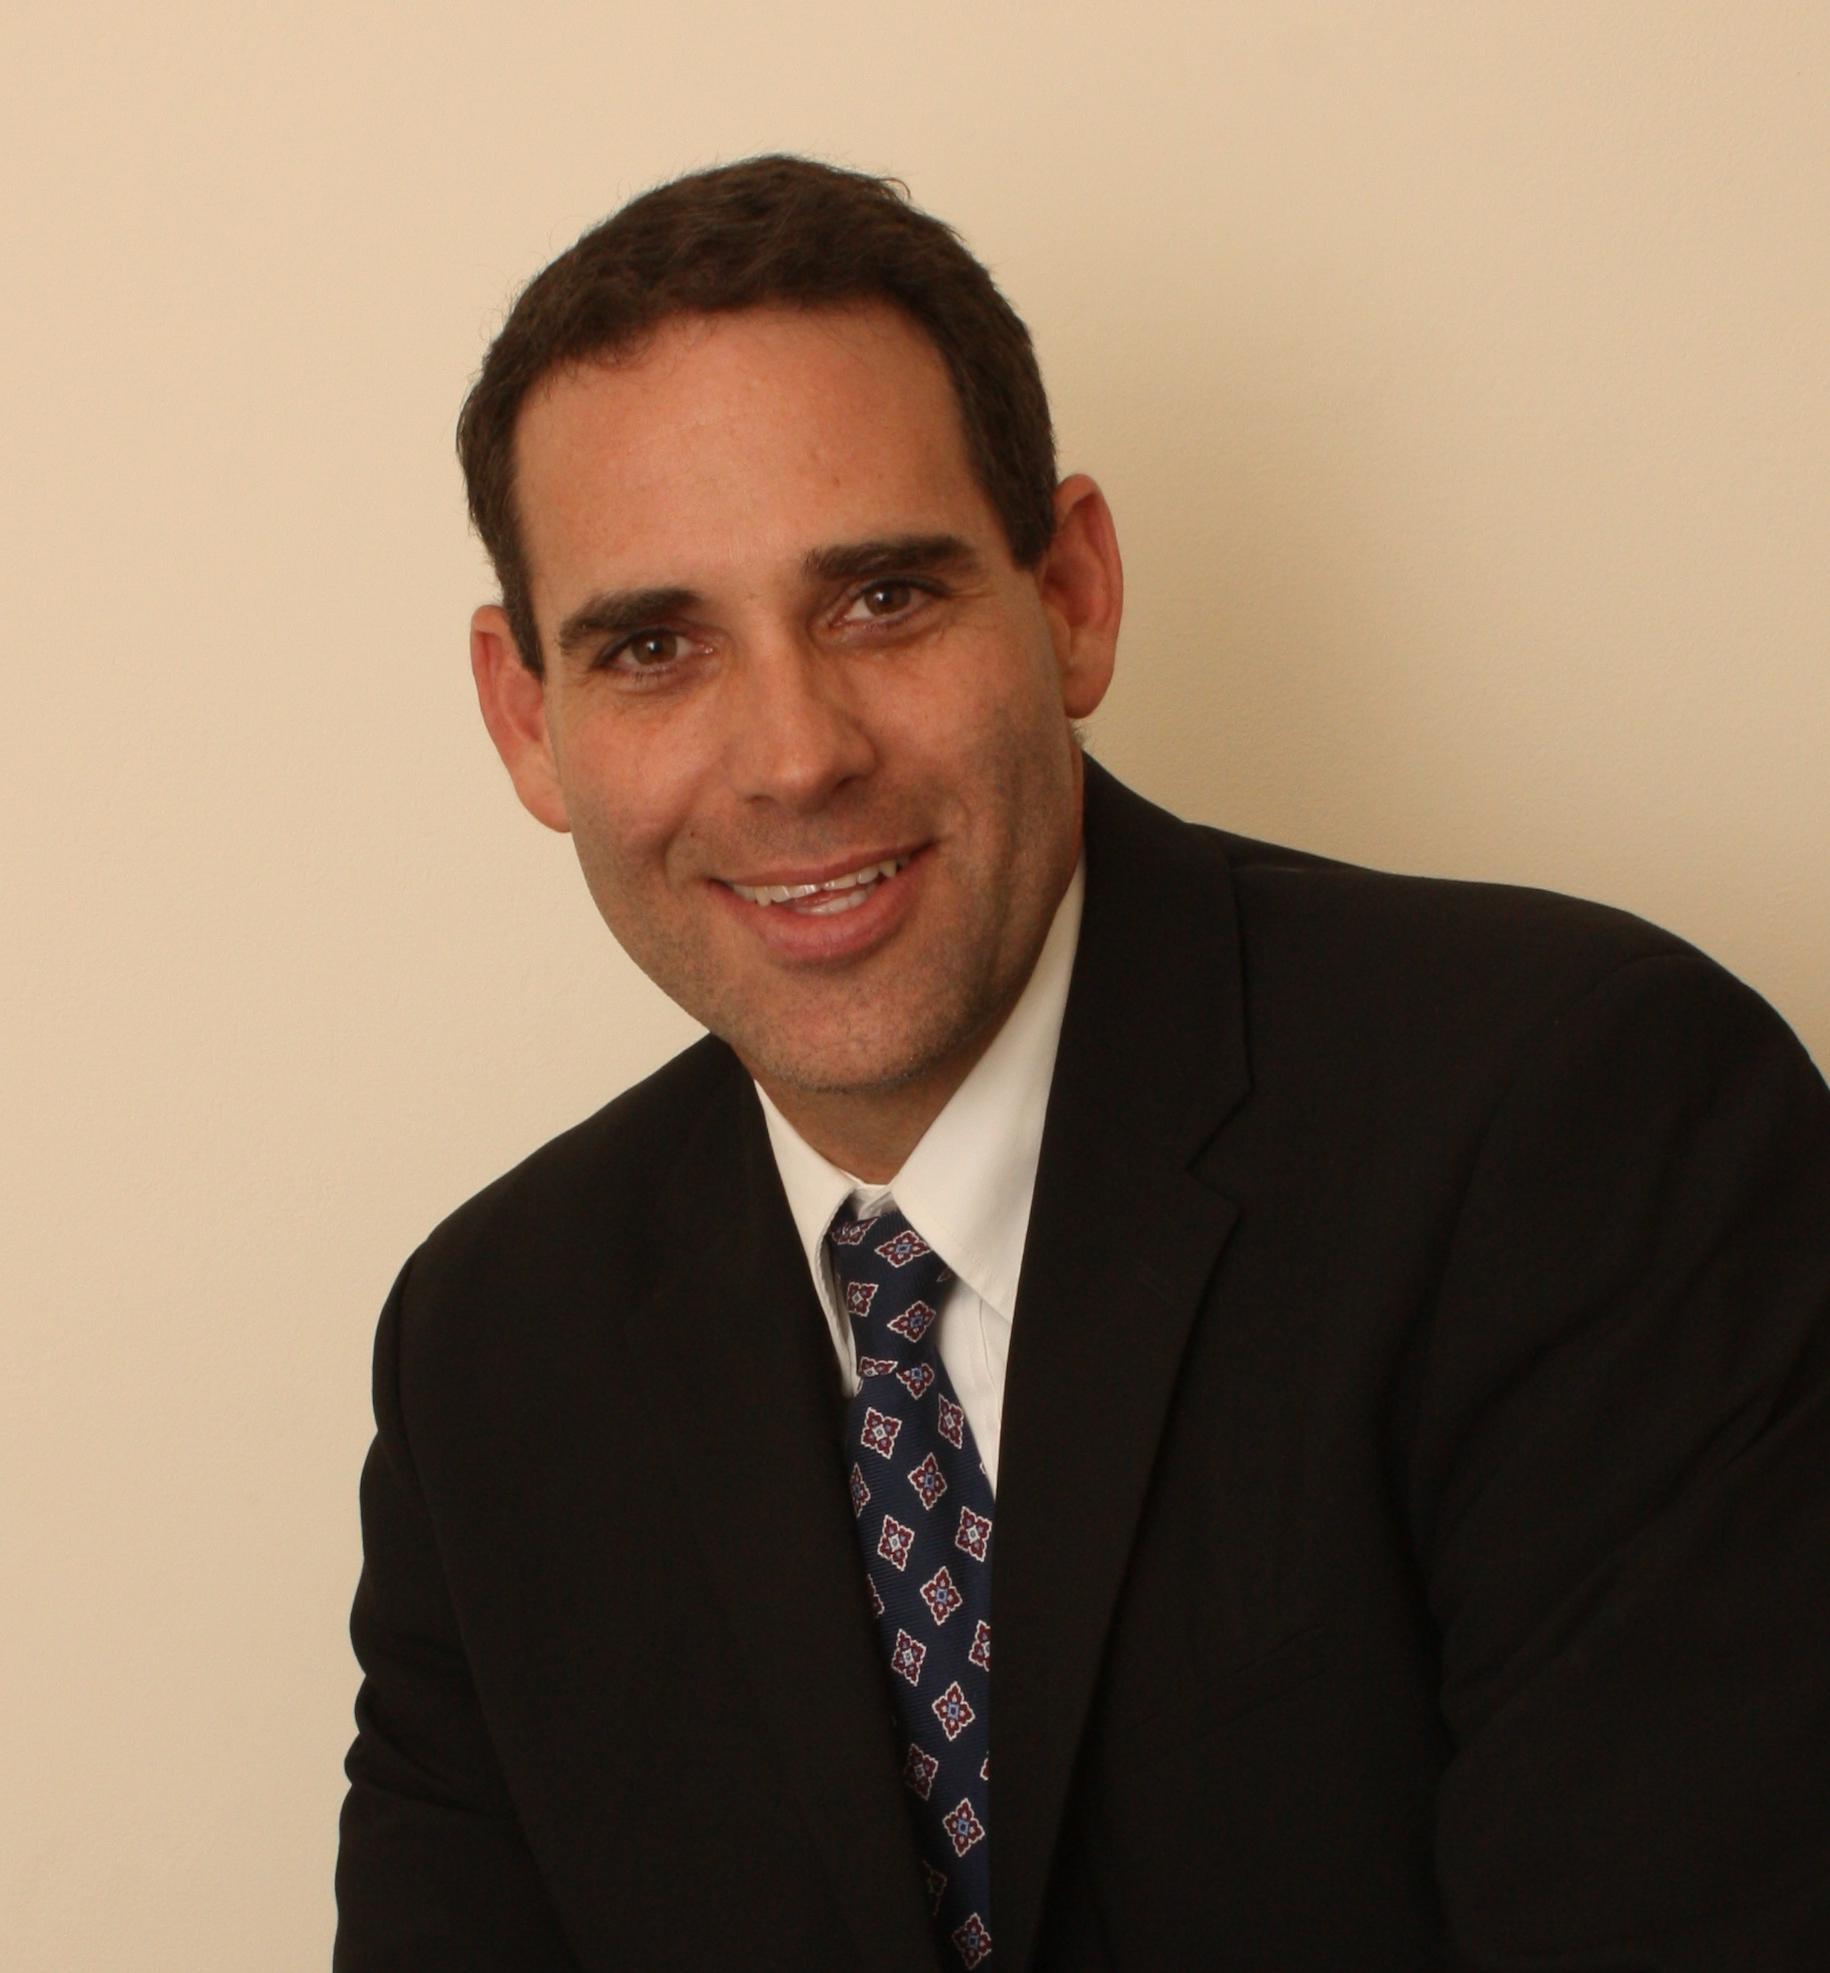 BOYD R. PHILLIPS Financial Advisor